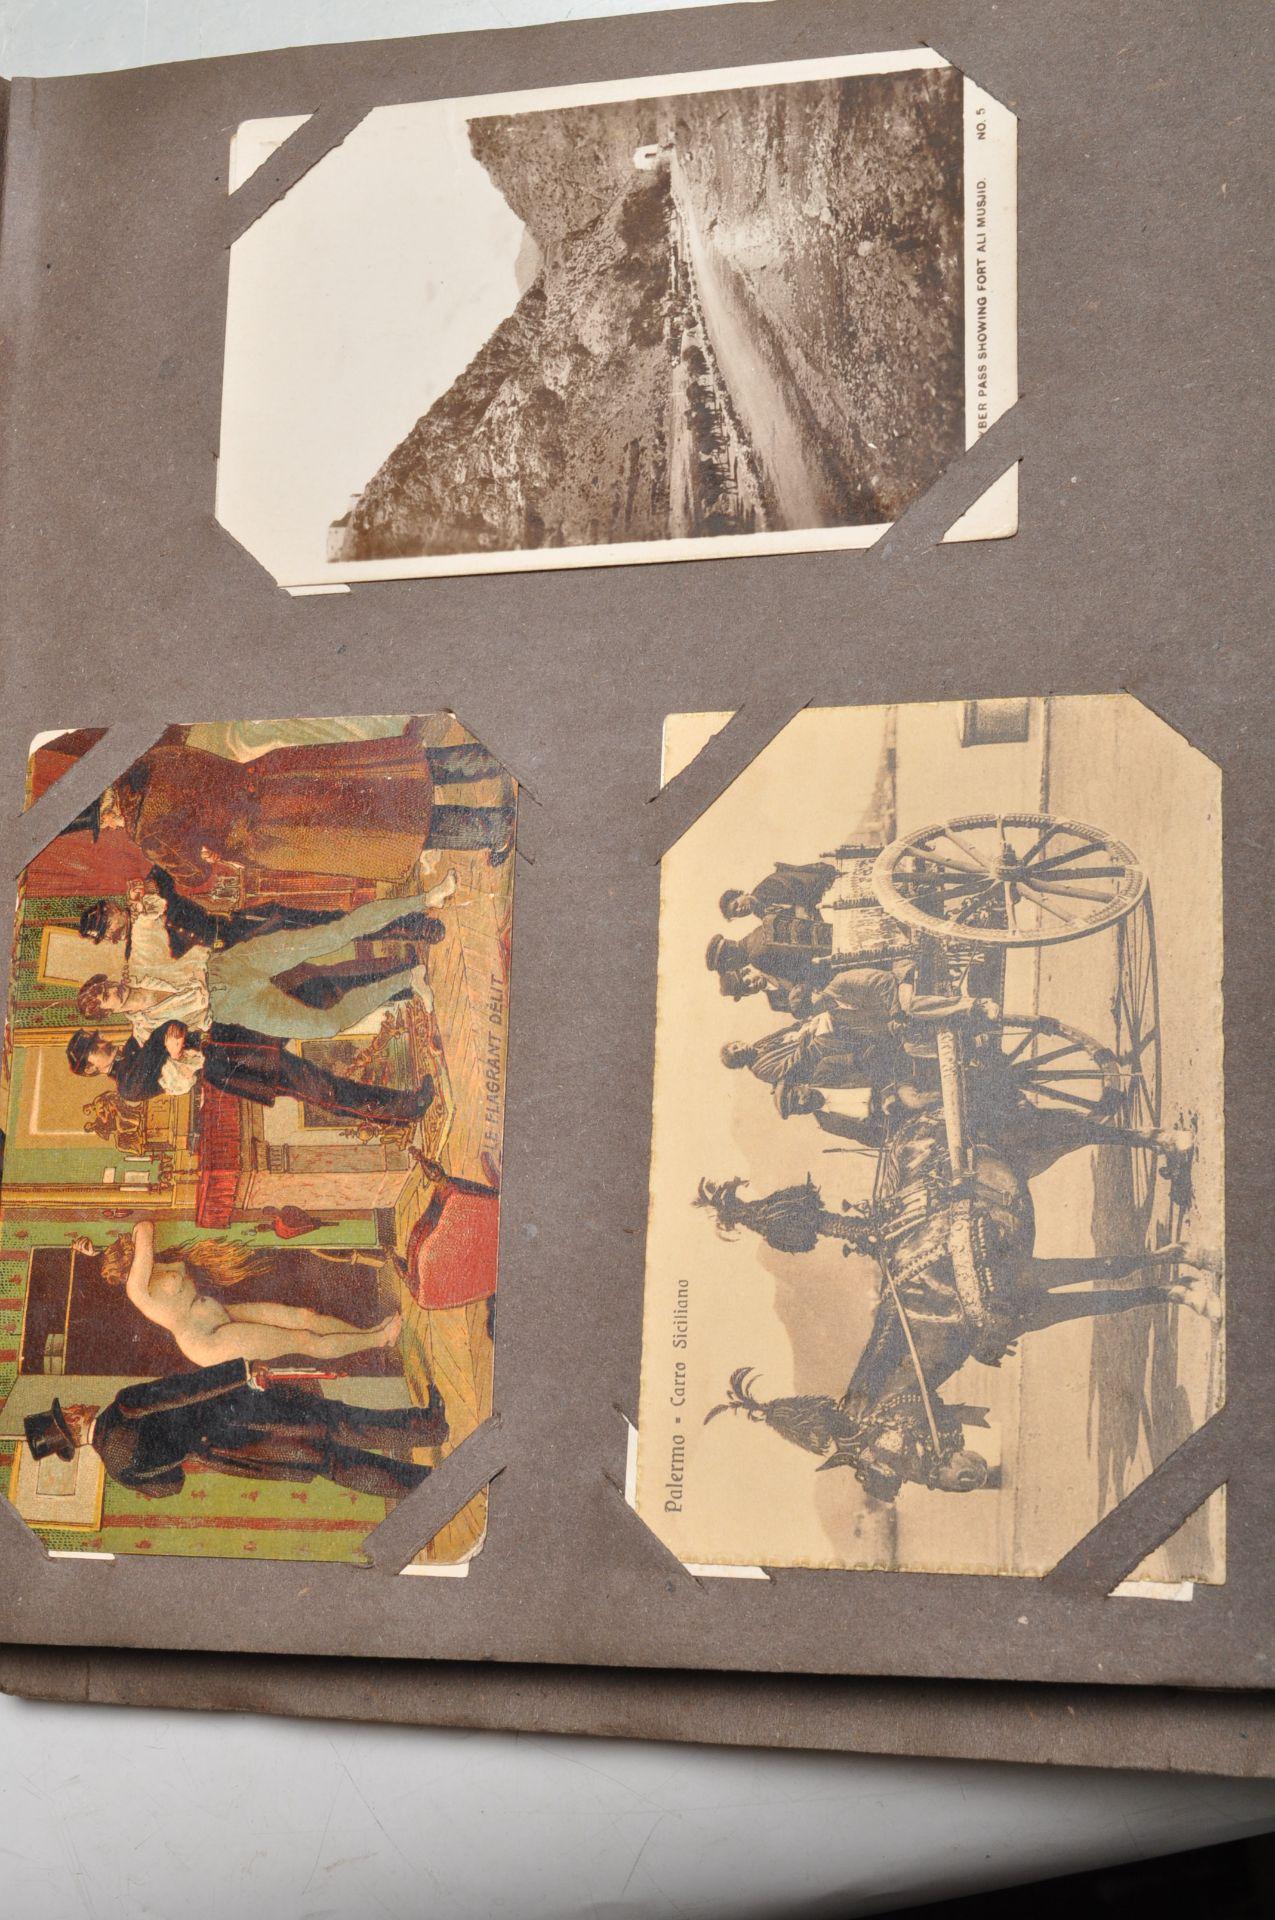 ALBUM OF FOREIGN POSTCARDS - ALL CIRCA WW1 PERIOD - Bild 16 aus 23